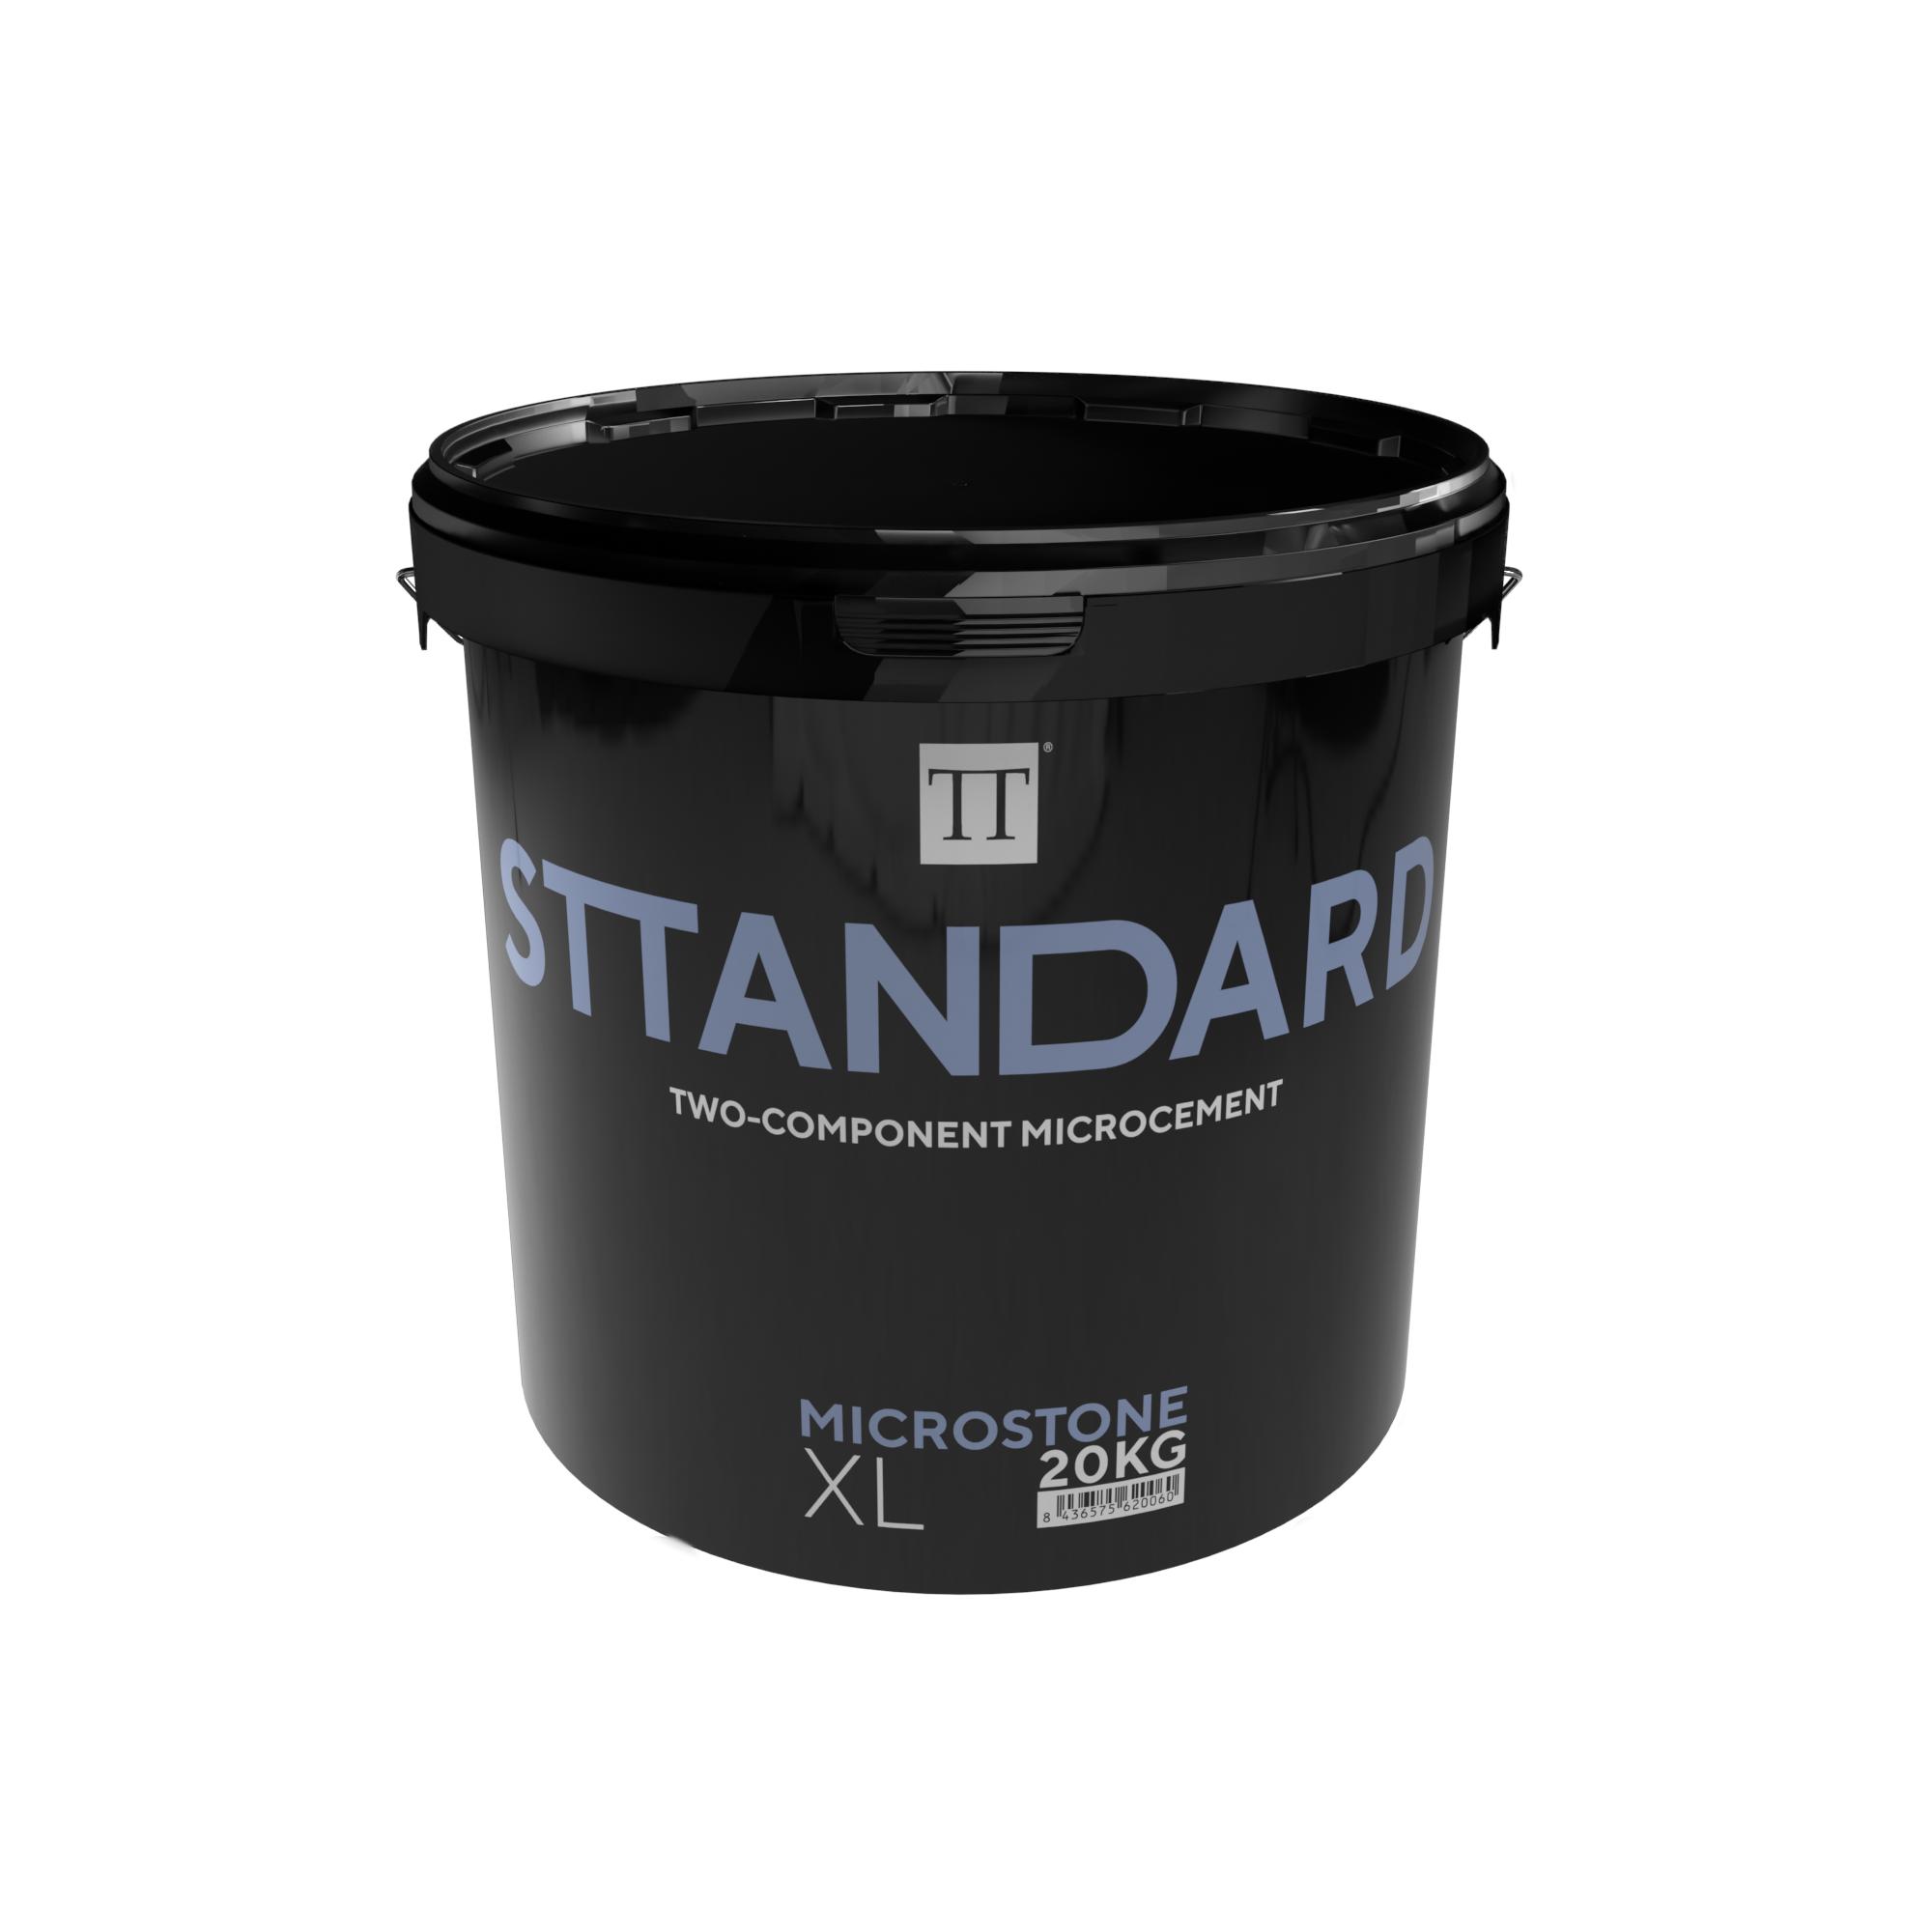 Sttandard Microstone 20 Kg